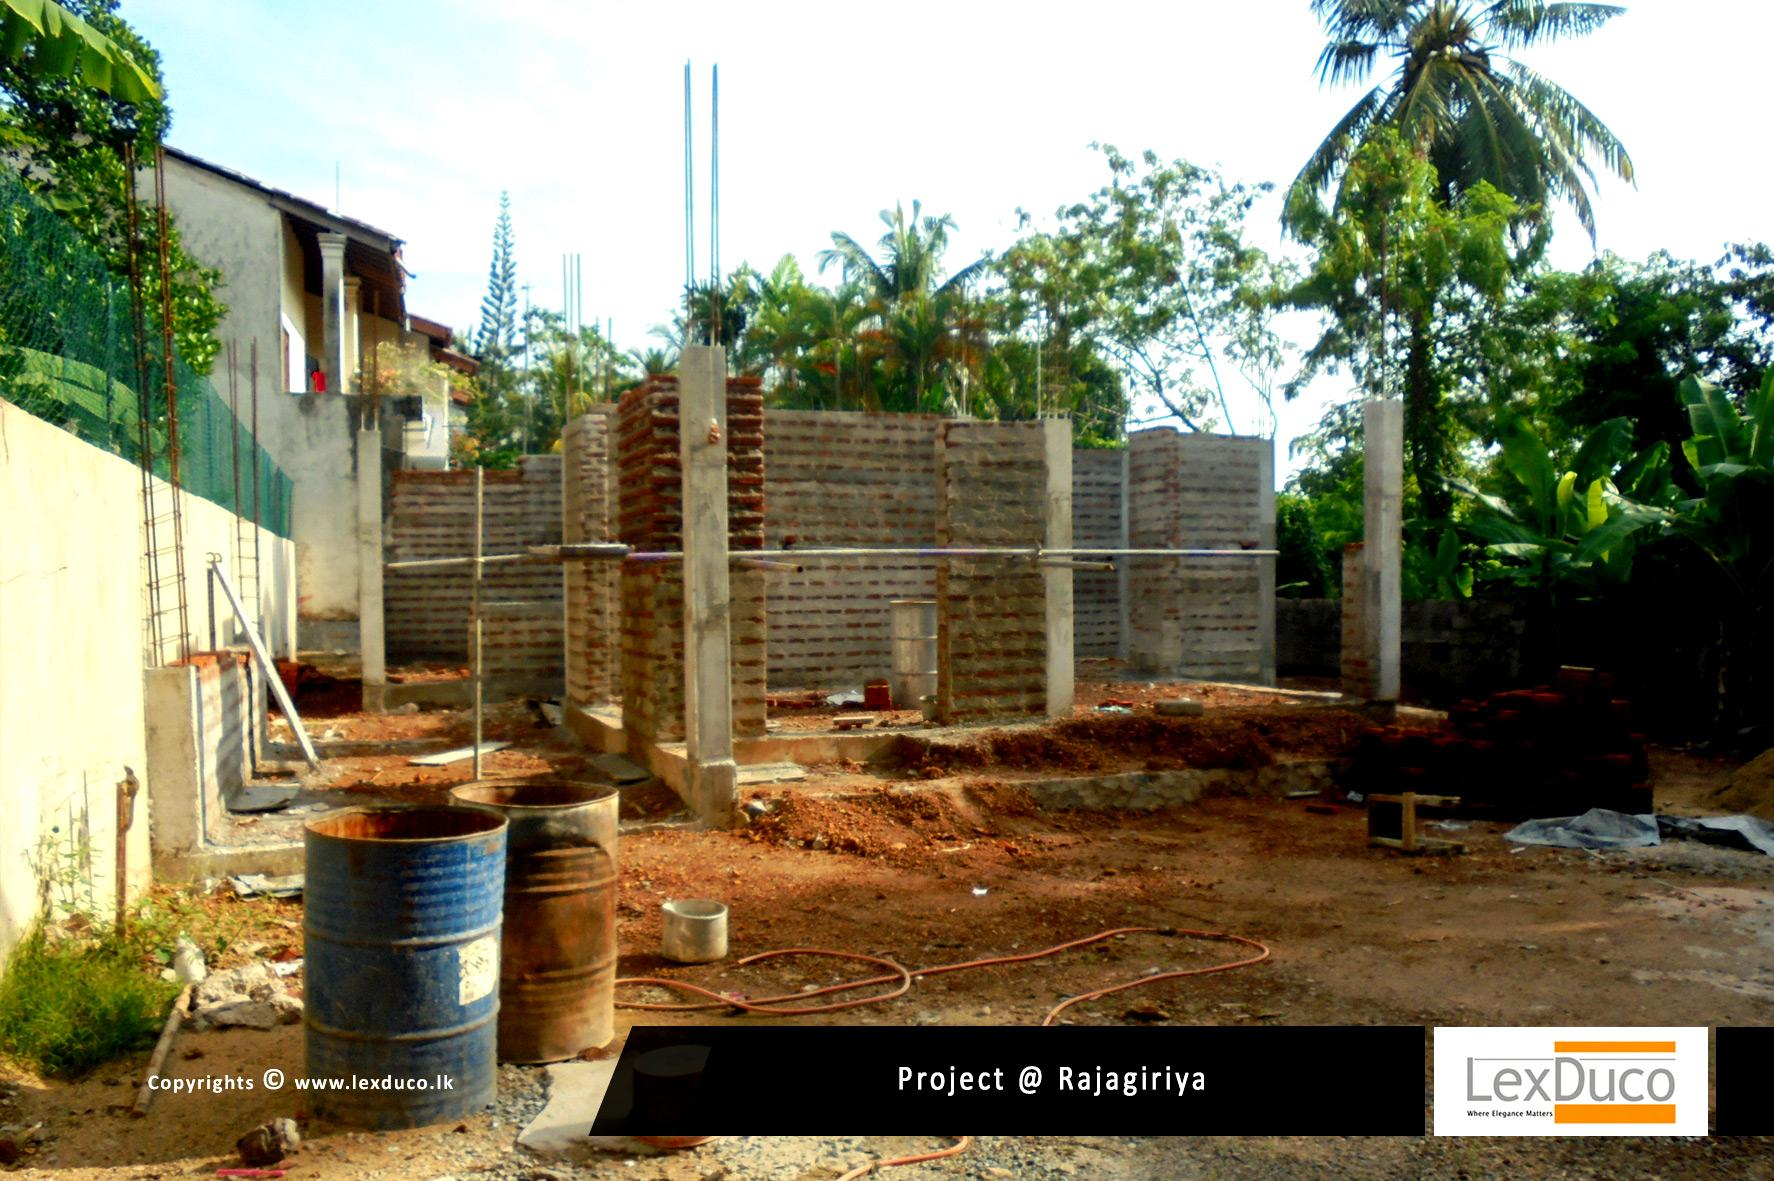 Residential Housing Project at Rajagiriya | Lex Duco